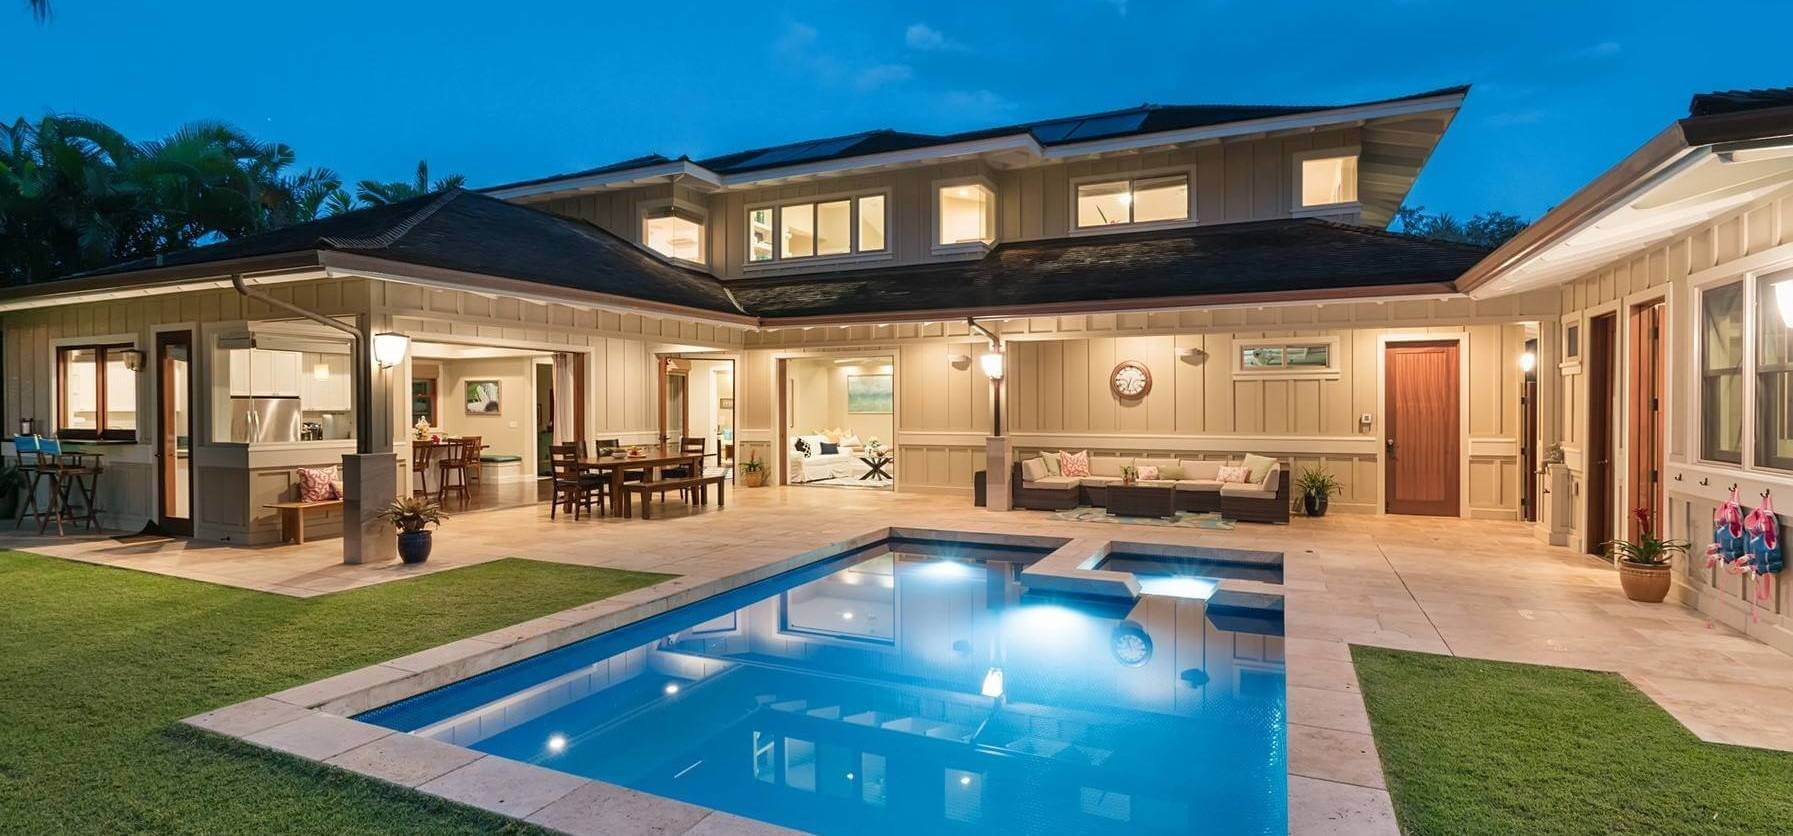 Real Estate Agent Oahu